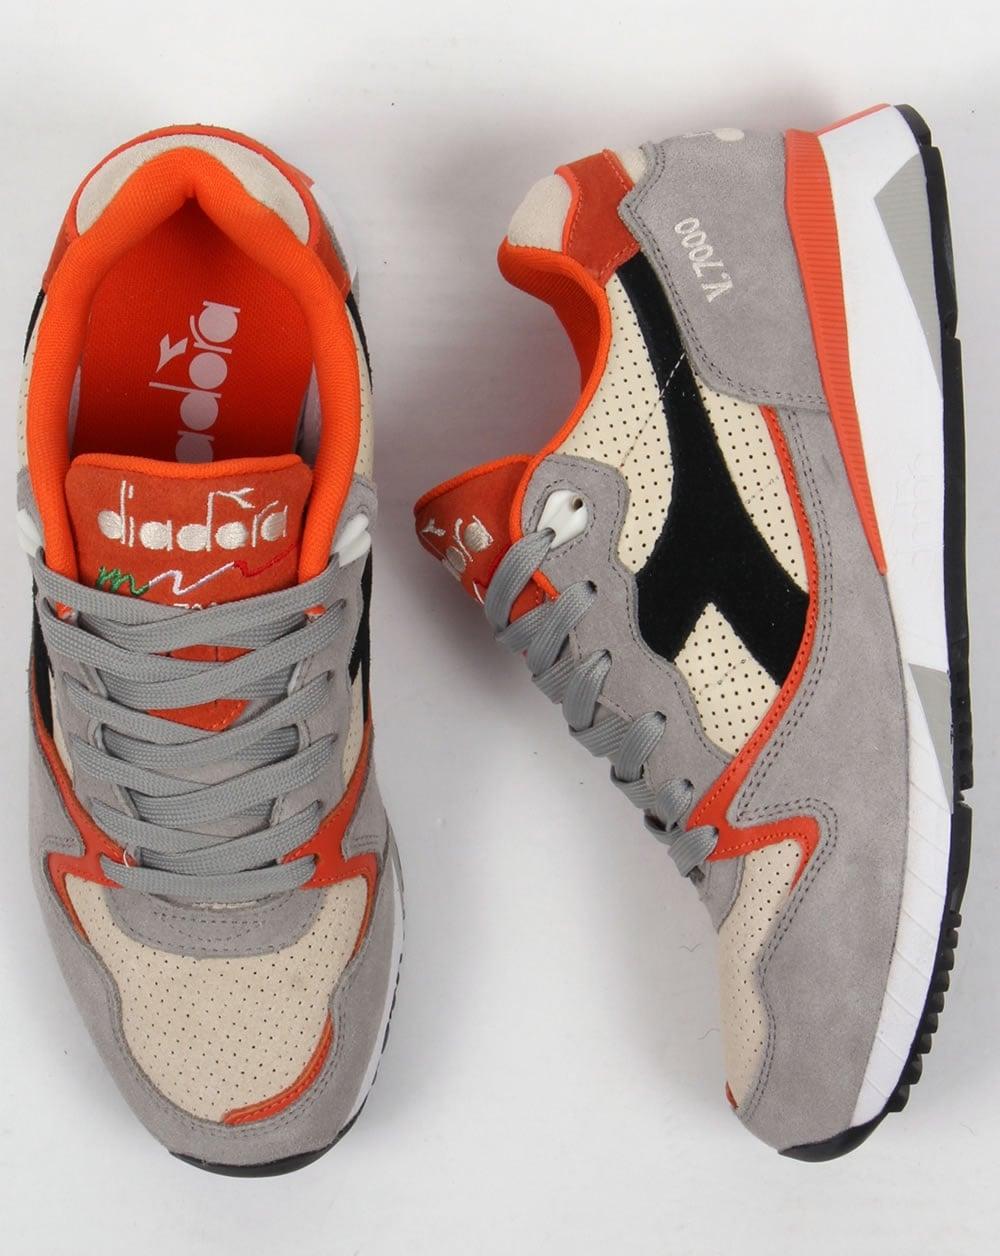 http://www.80scasualclassics.co.uk/images/diadora-v7000-premium-trainers-grey-orange-p5044-44020_zoom.jpg